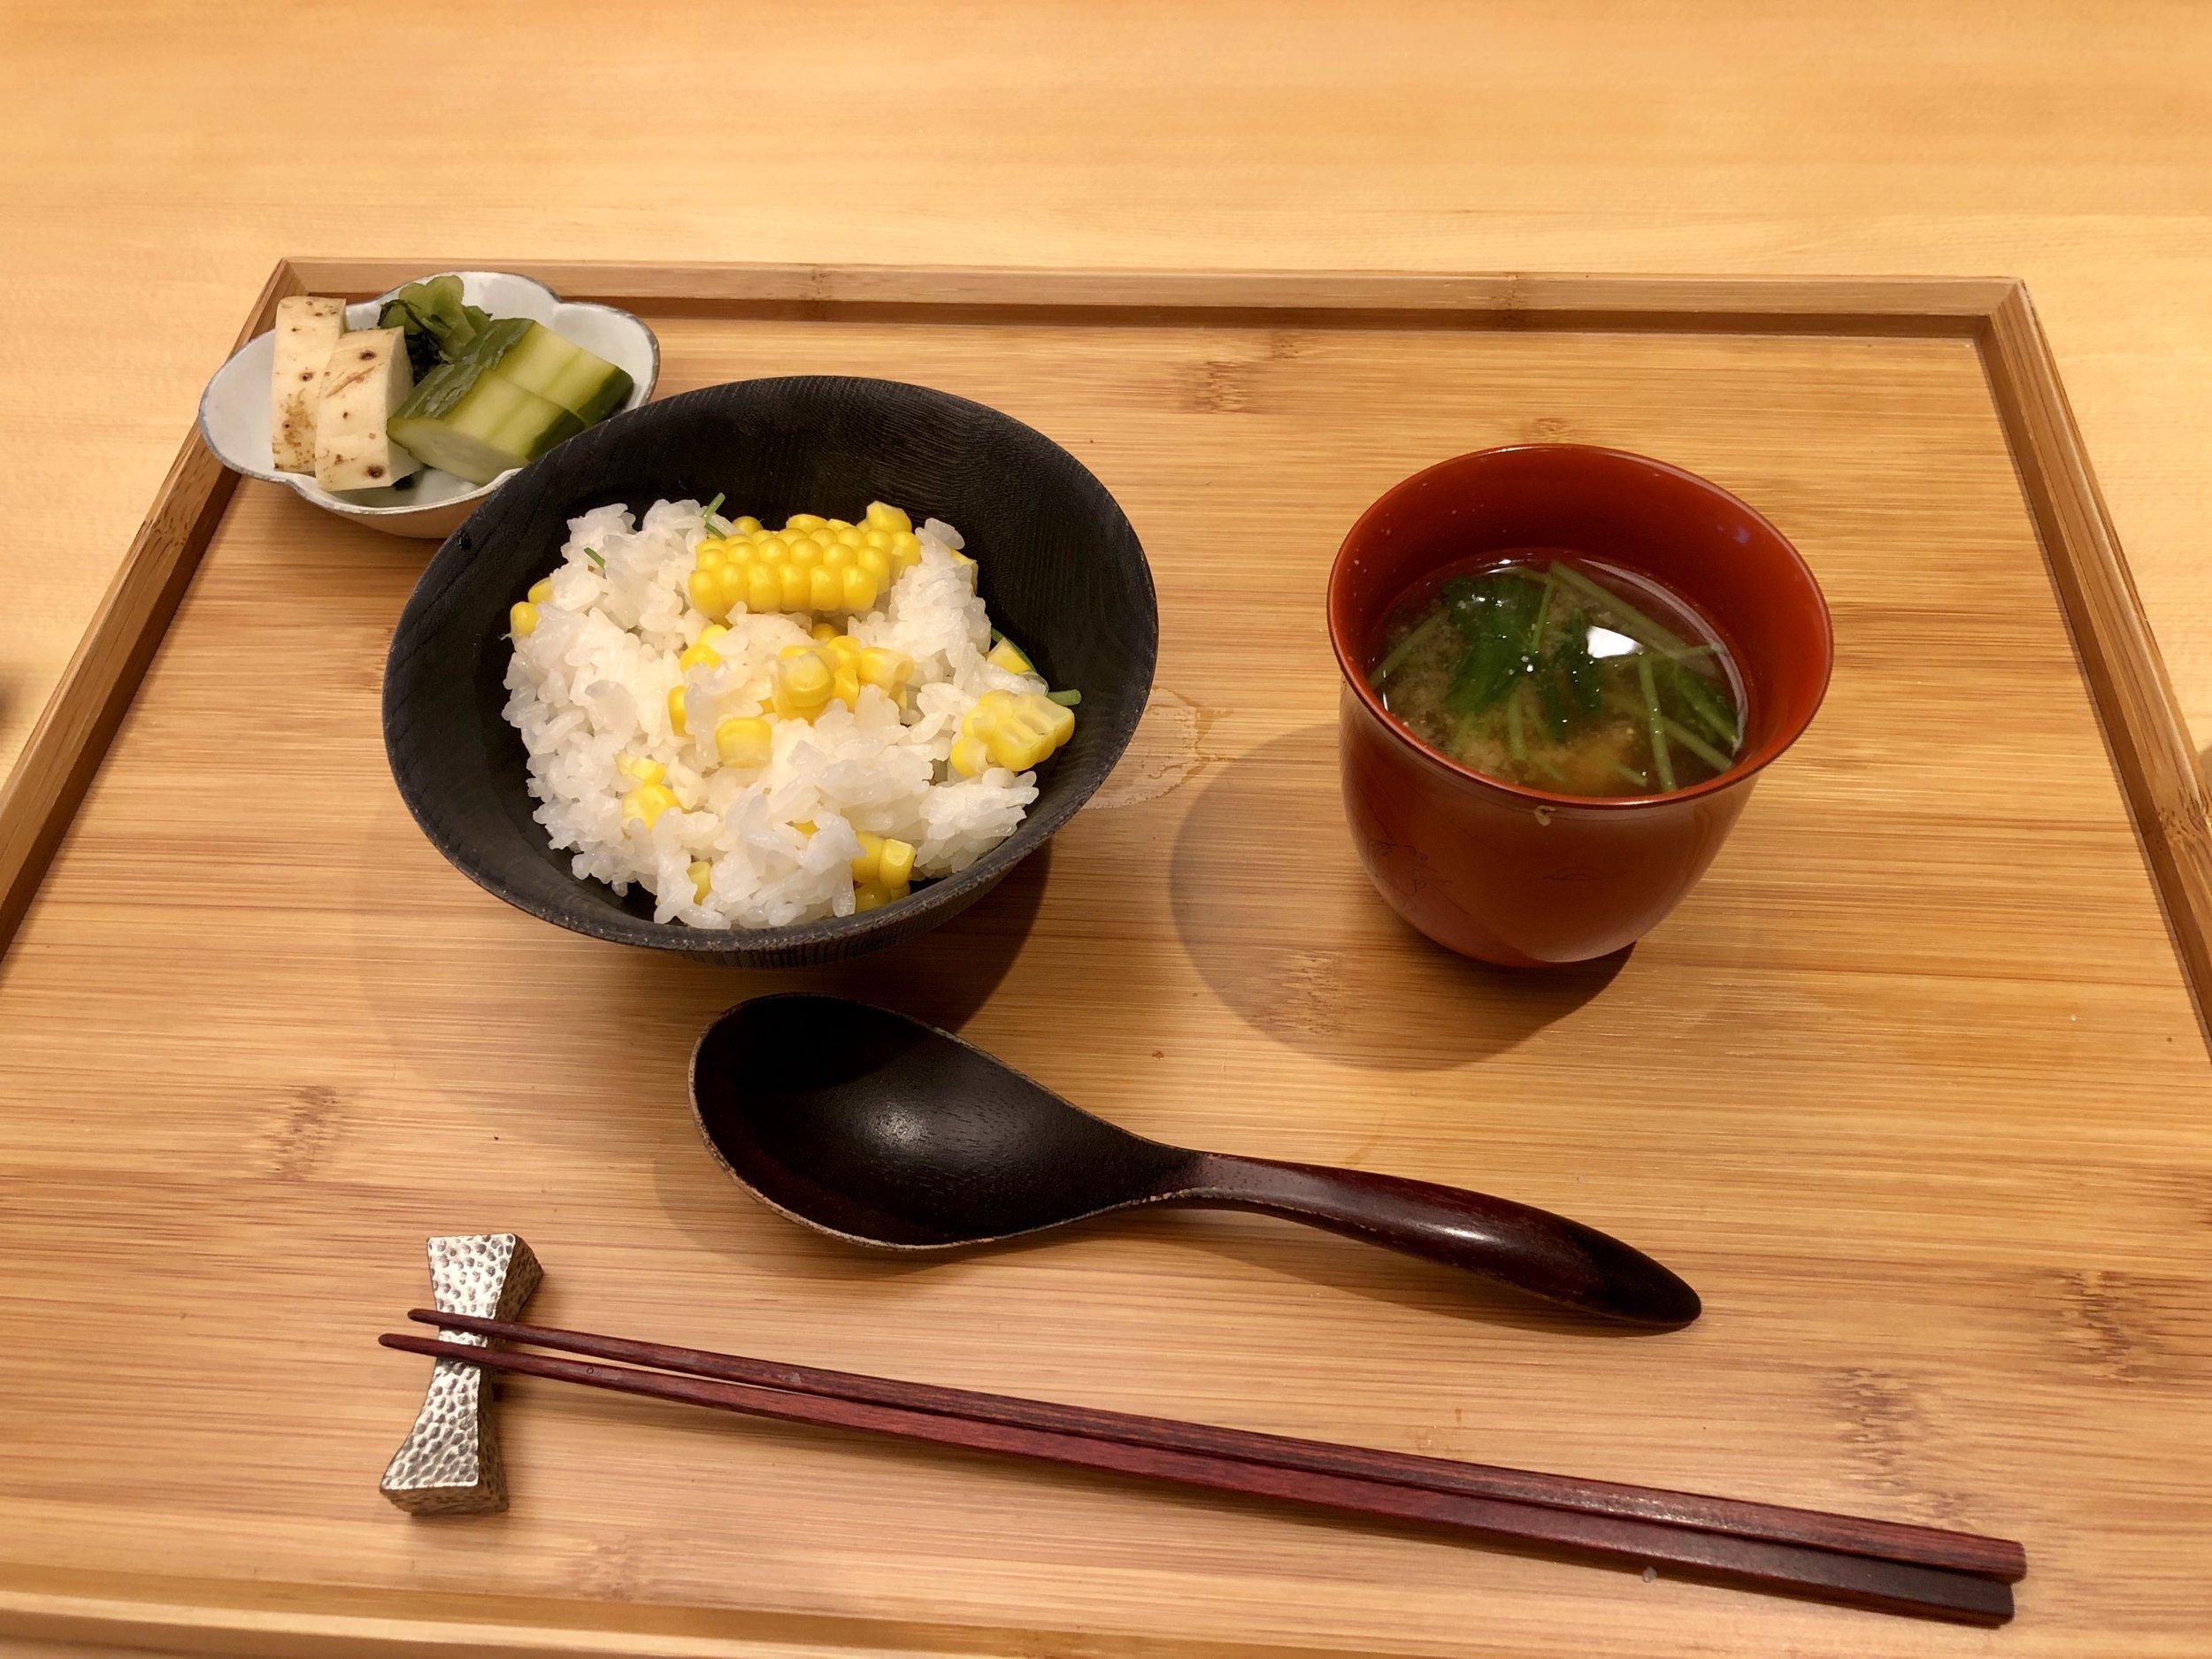 Gohan, Ko no mono, Tome wan 御飯、 香の物、 止椀 Rice, pickled vegetables, miso soup